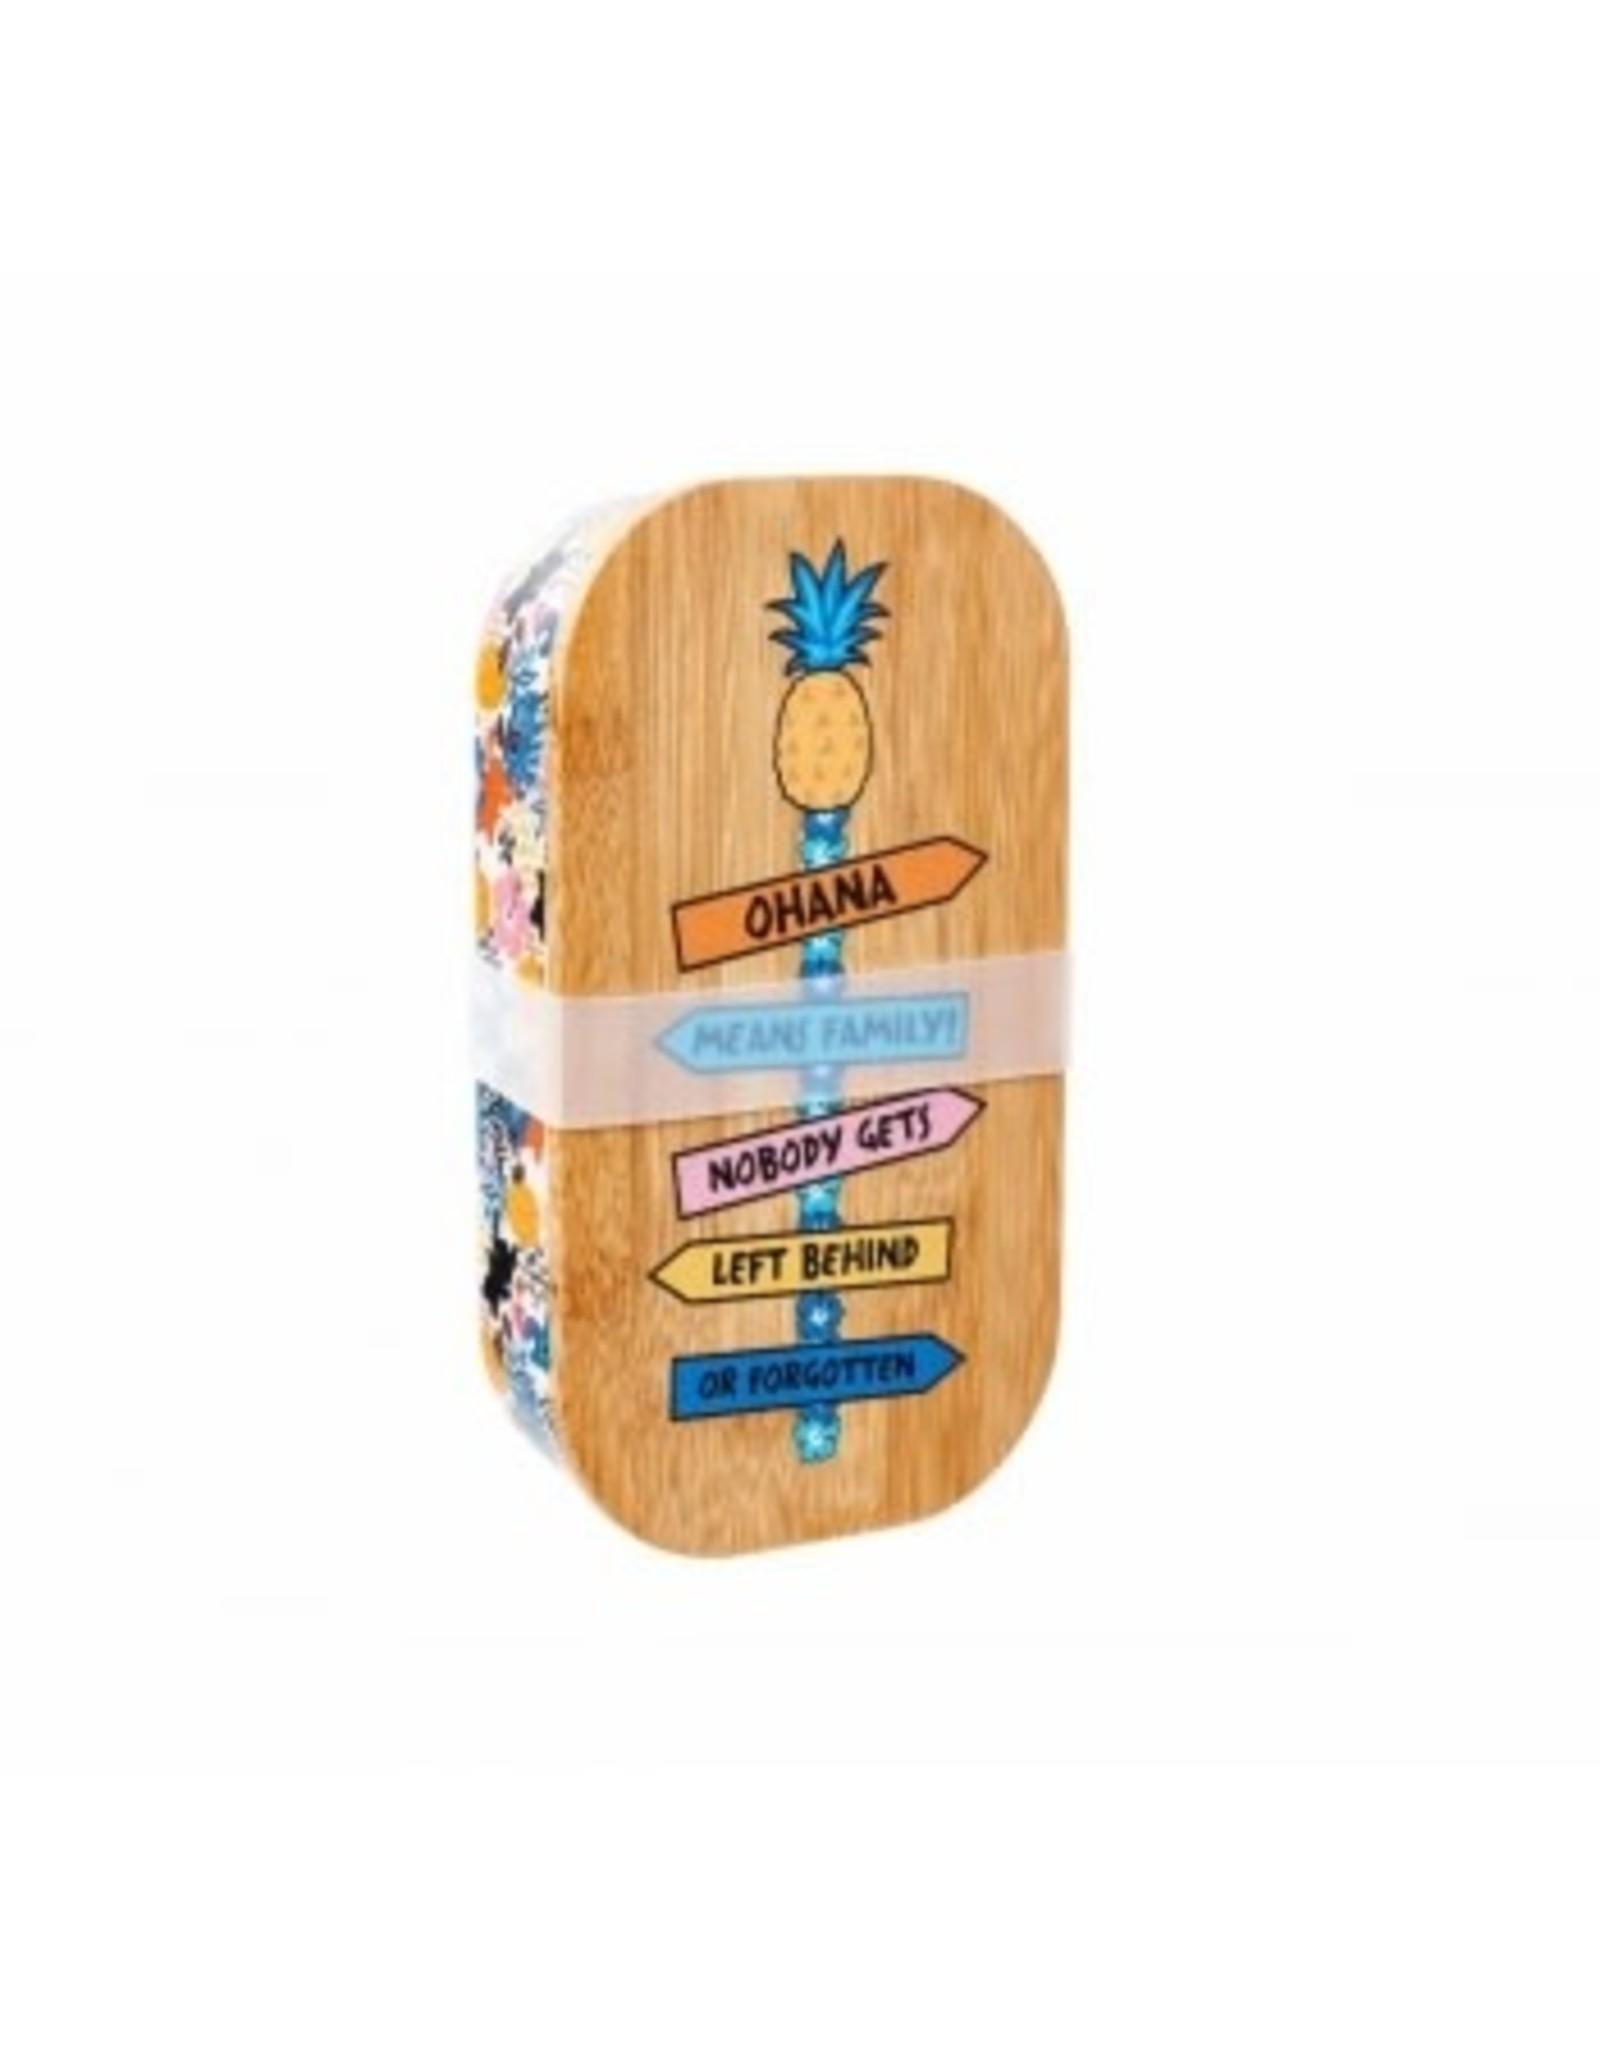 Funko LILO & STITCH Lunch Box - Ohana